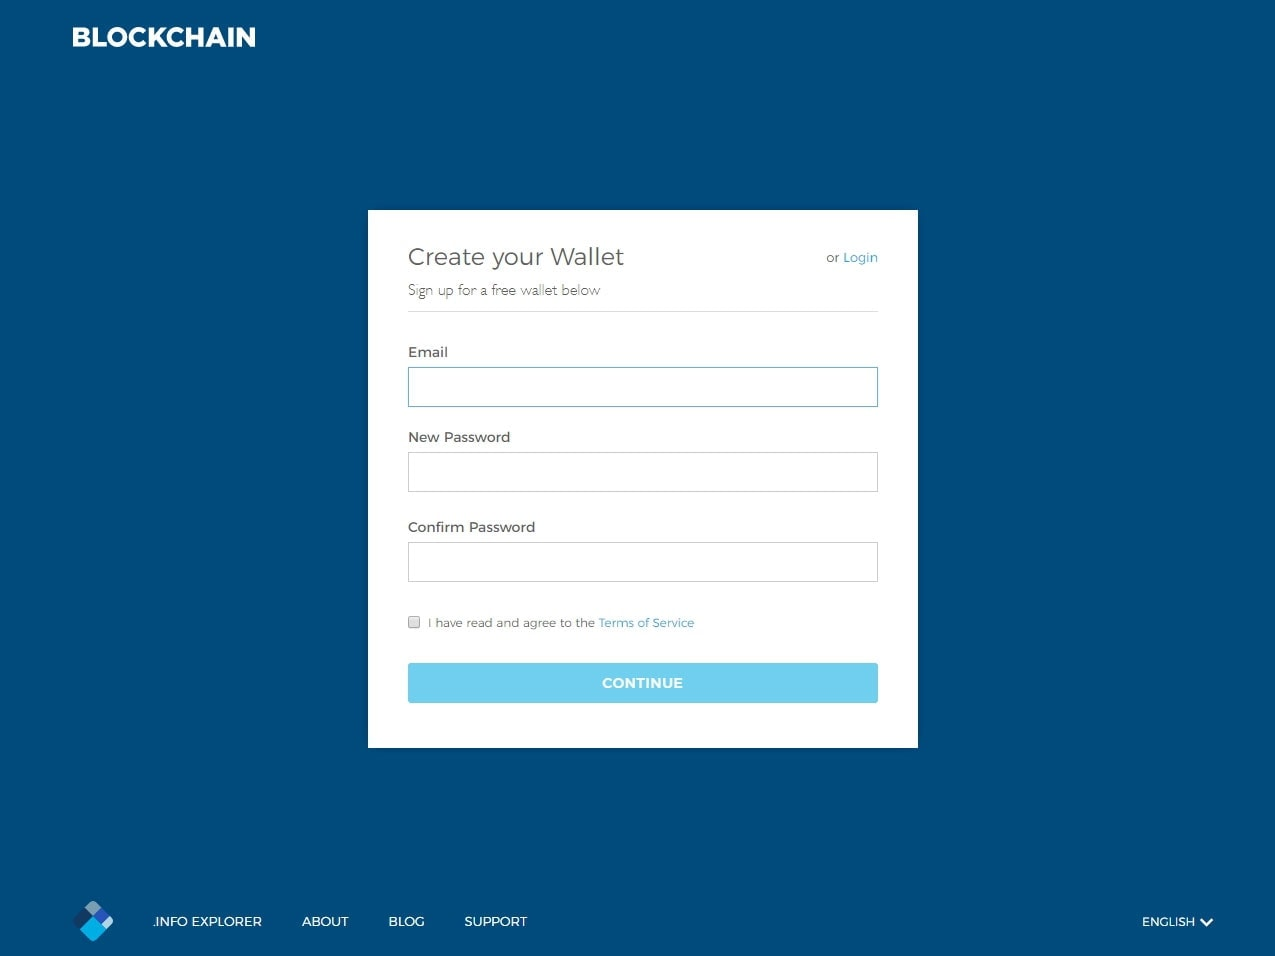 Creating a Blockchain.info Wallet